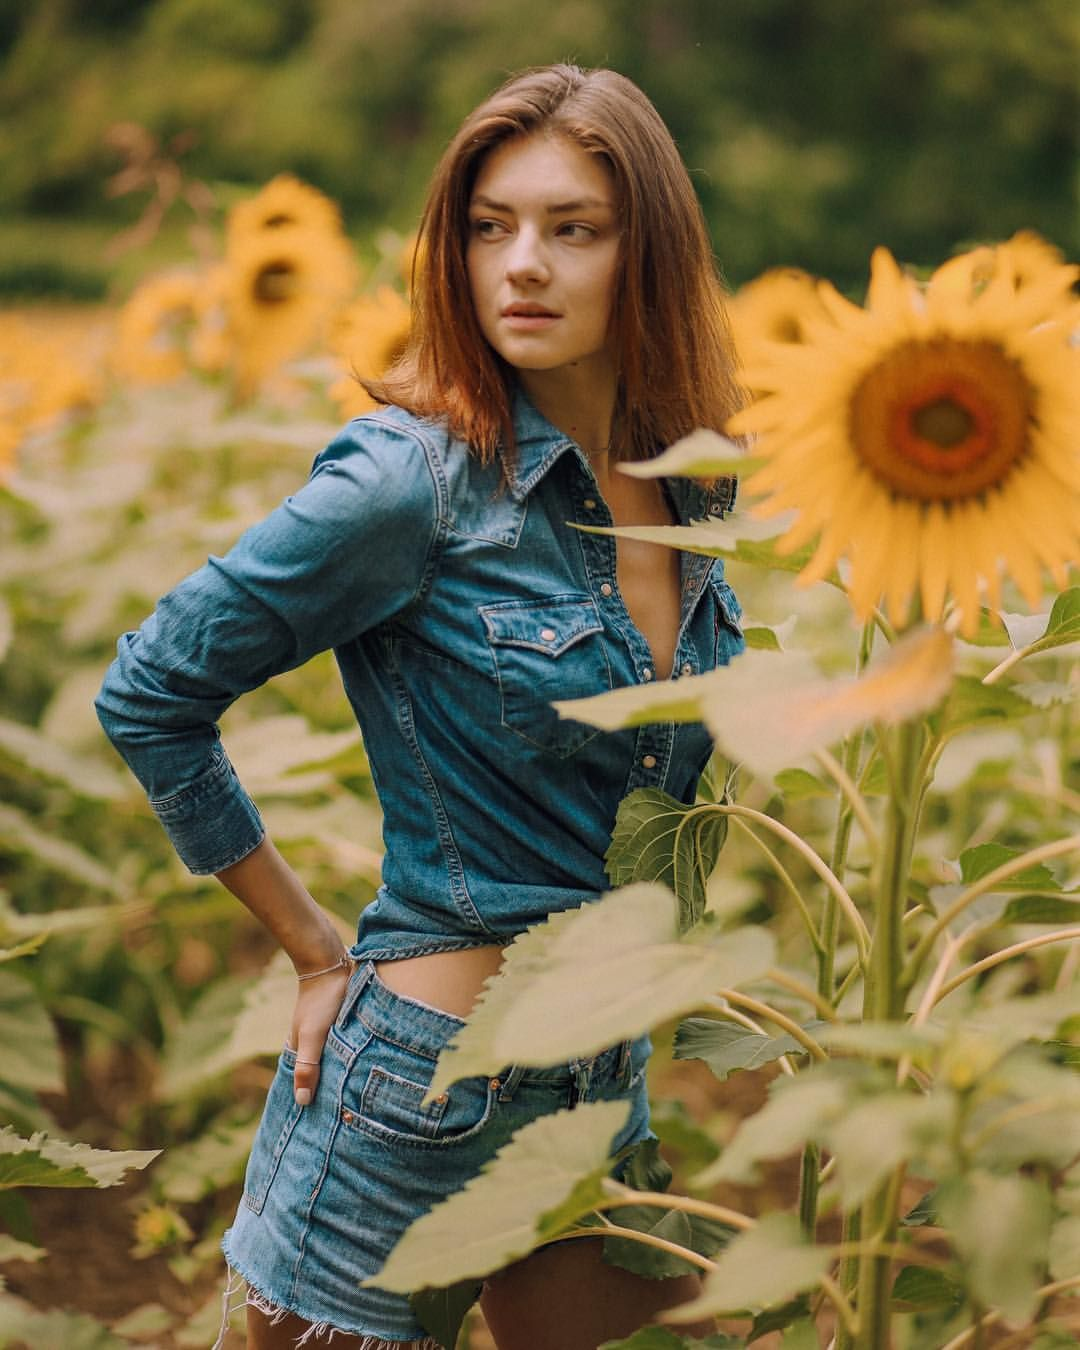 Watch Vika Levina RUS video